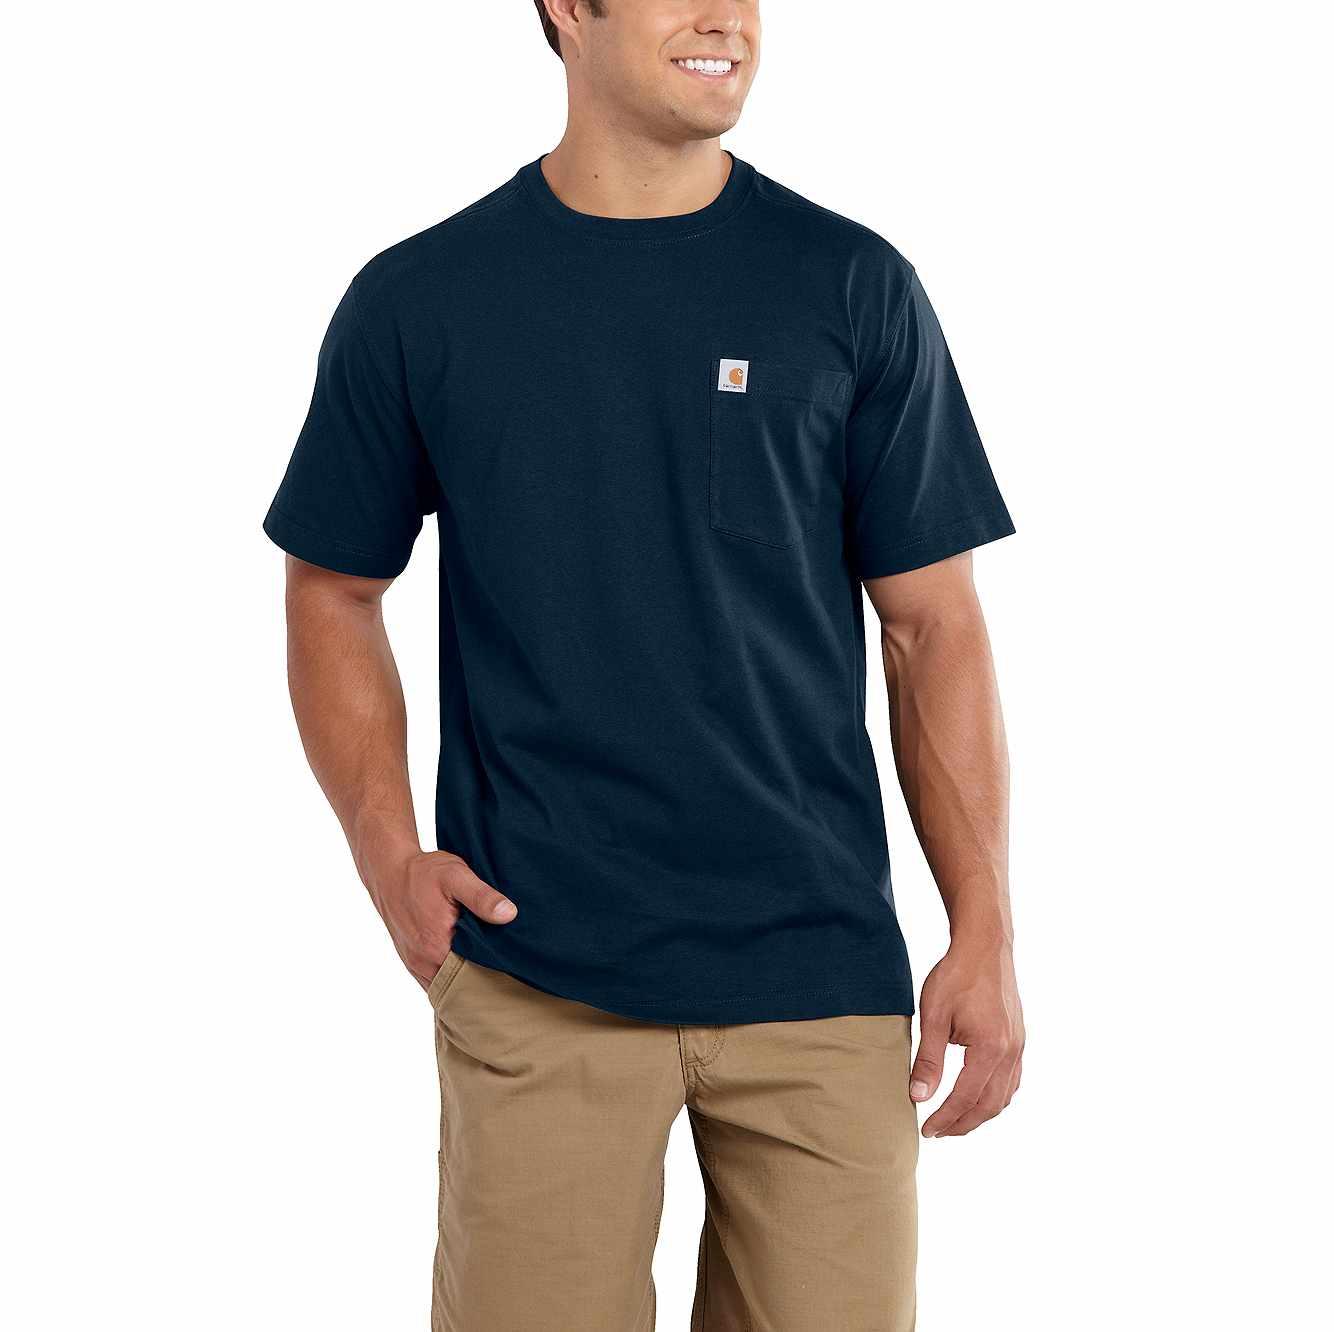 78c6d710b96ba Men s Maddock Pocket Short-Sleeve T-Shirt 101125